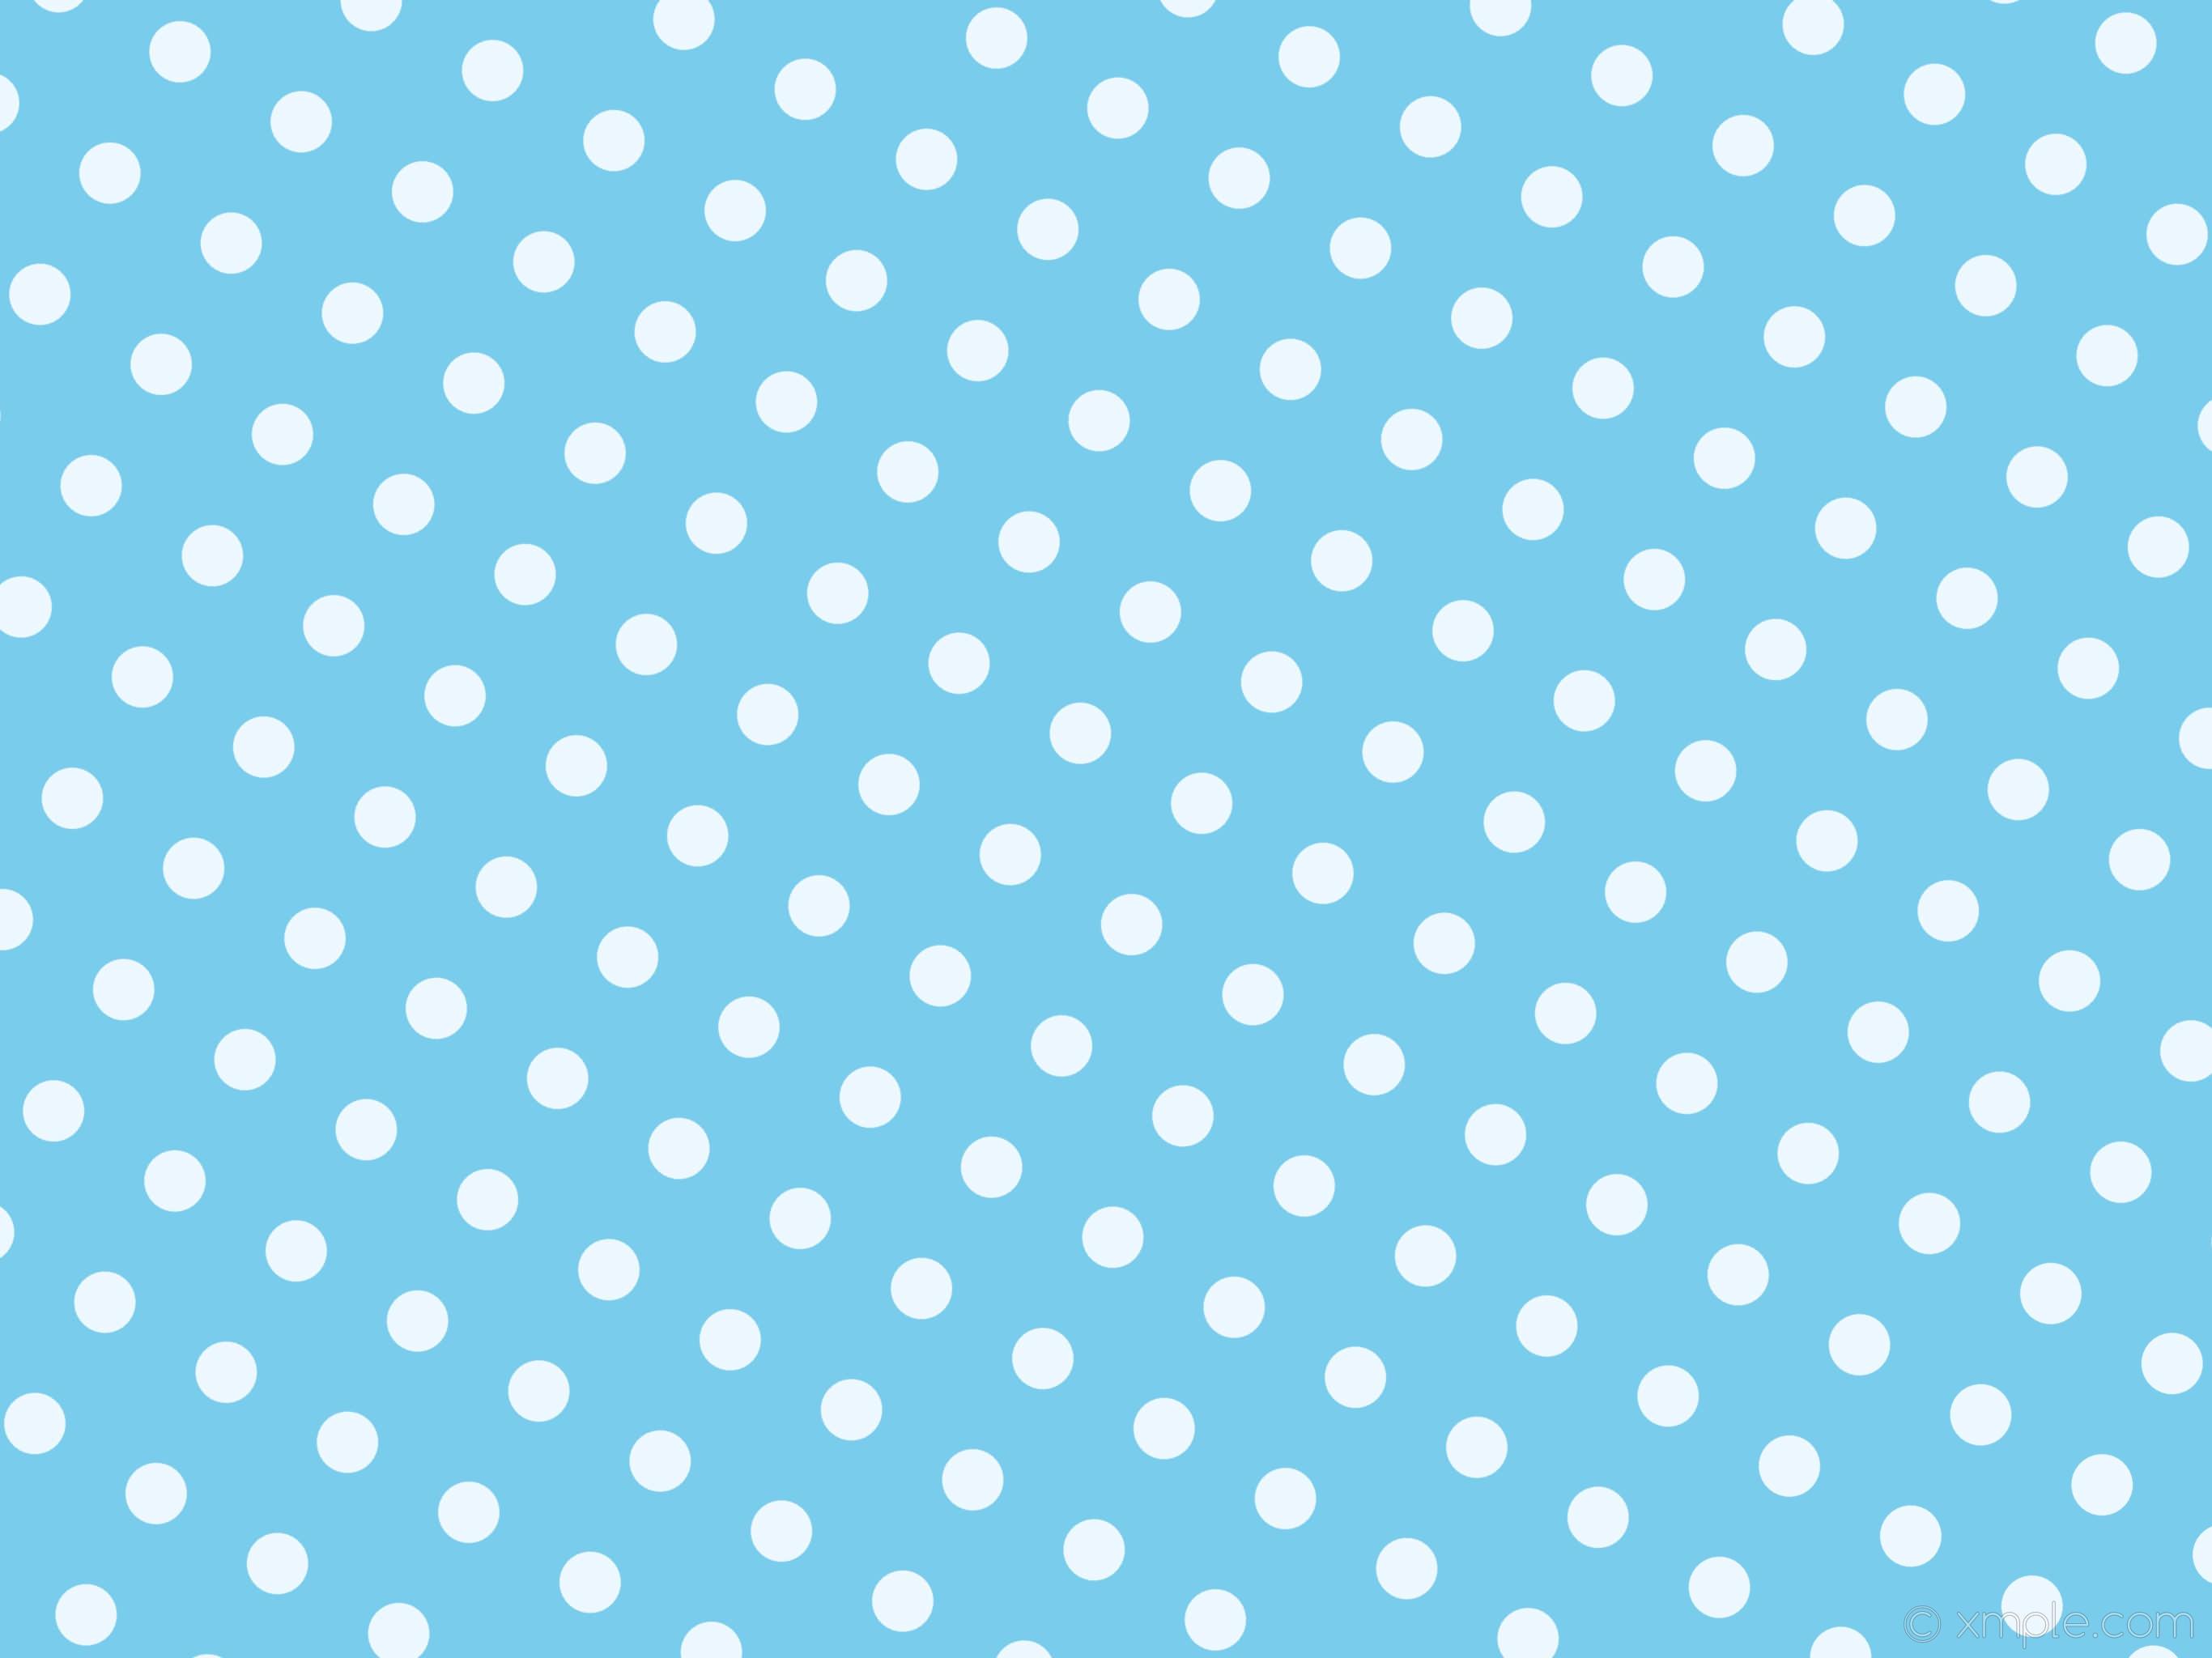 Polka dot wallpapers 51 images for Polka dot wallpaper